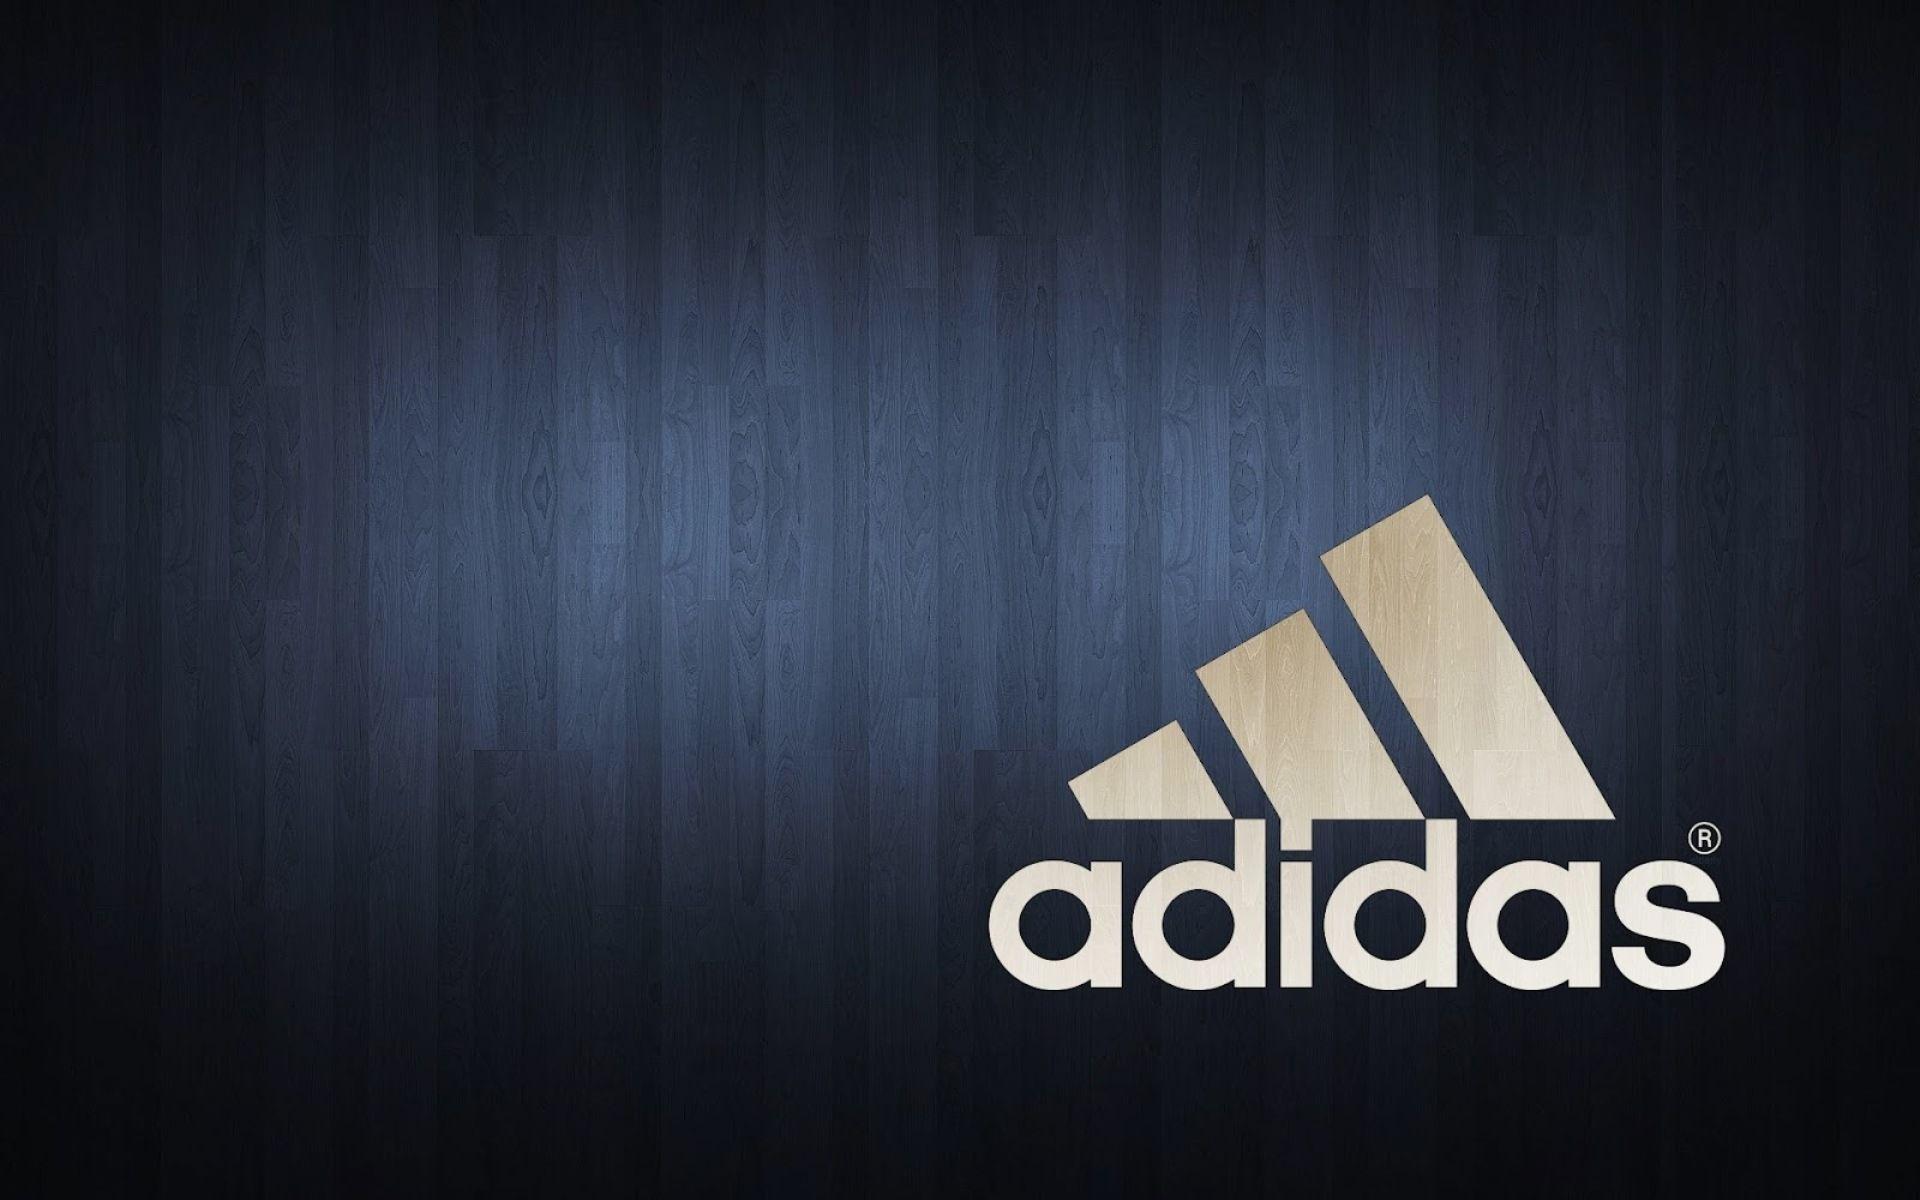 Adidas Logo Wallpapers - WallpaperSafari